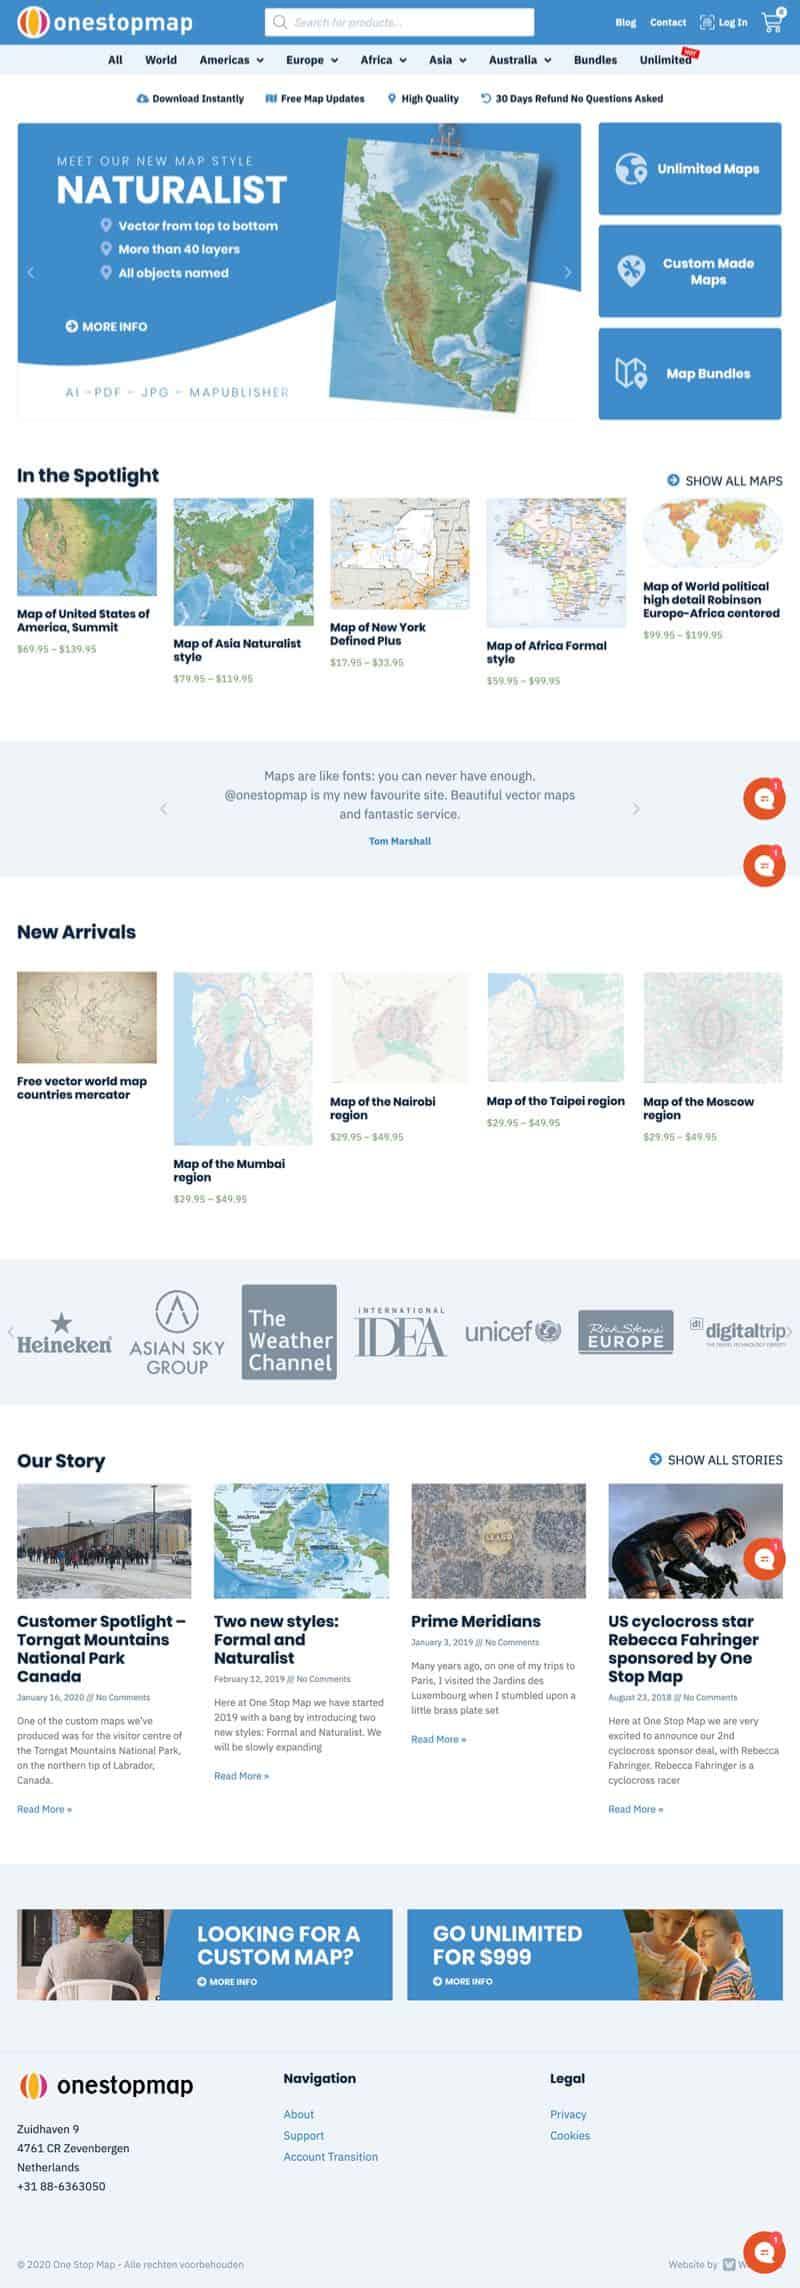 one-stop-map-webmatic-portfolio-13248-800